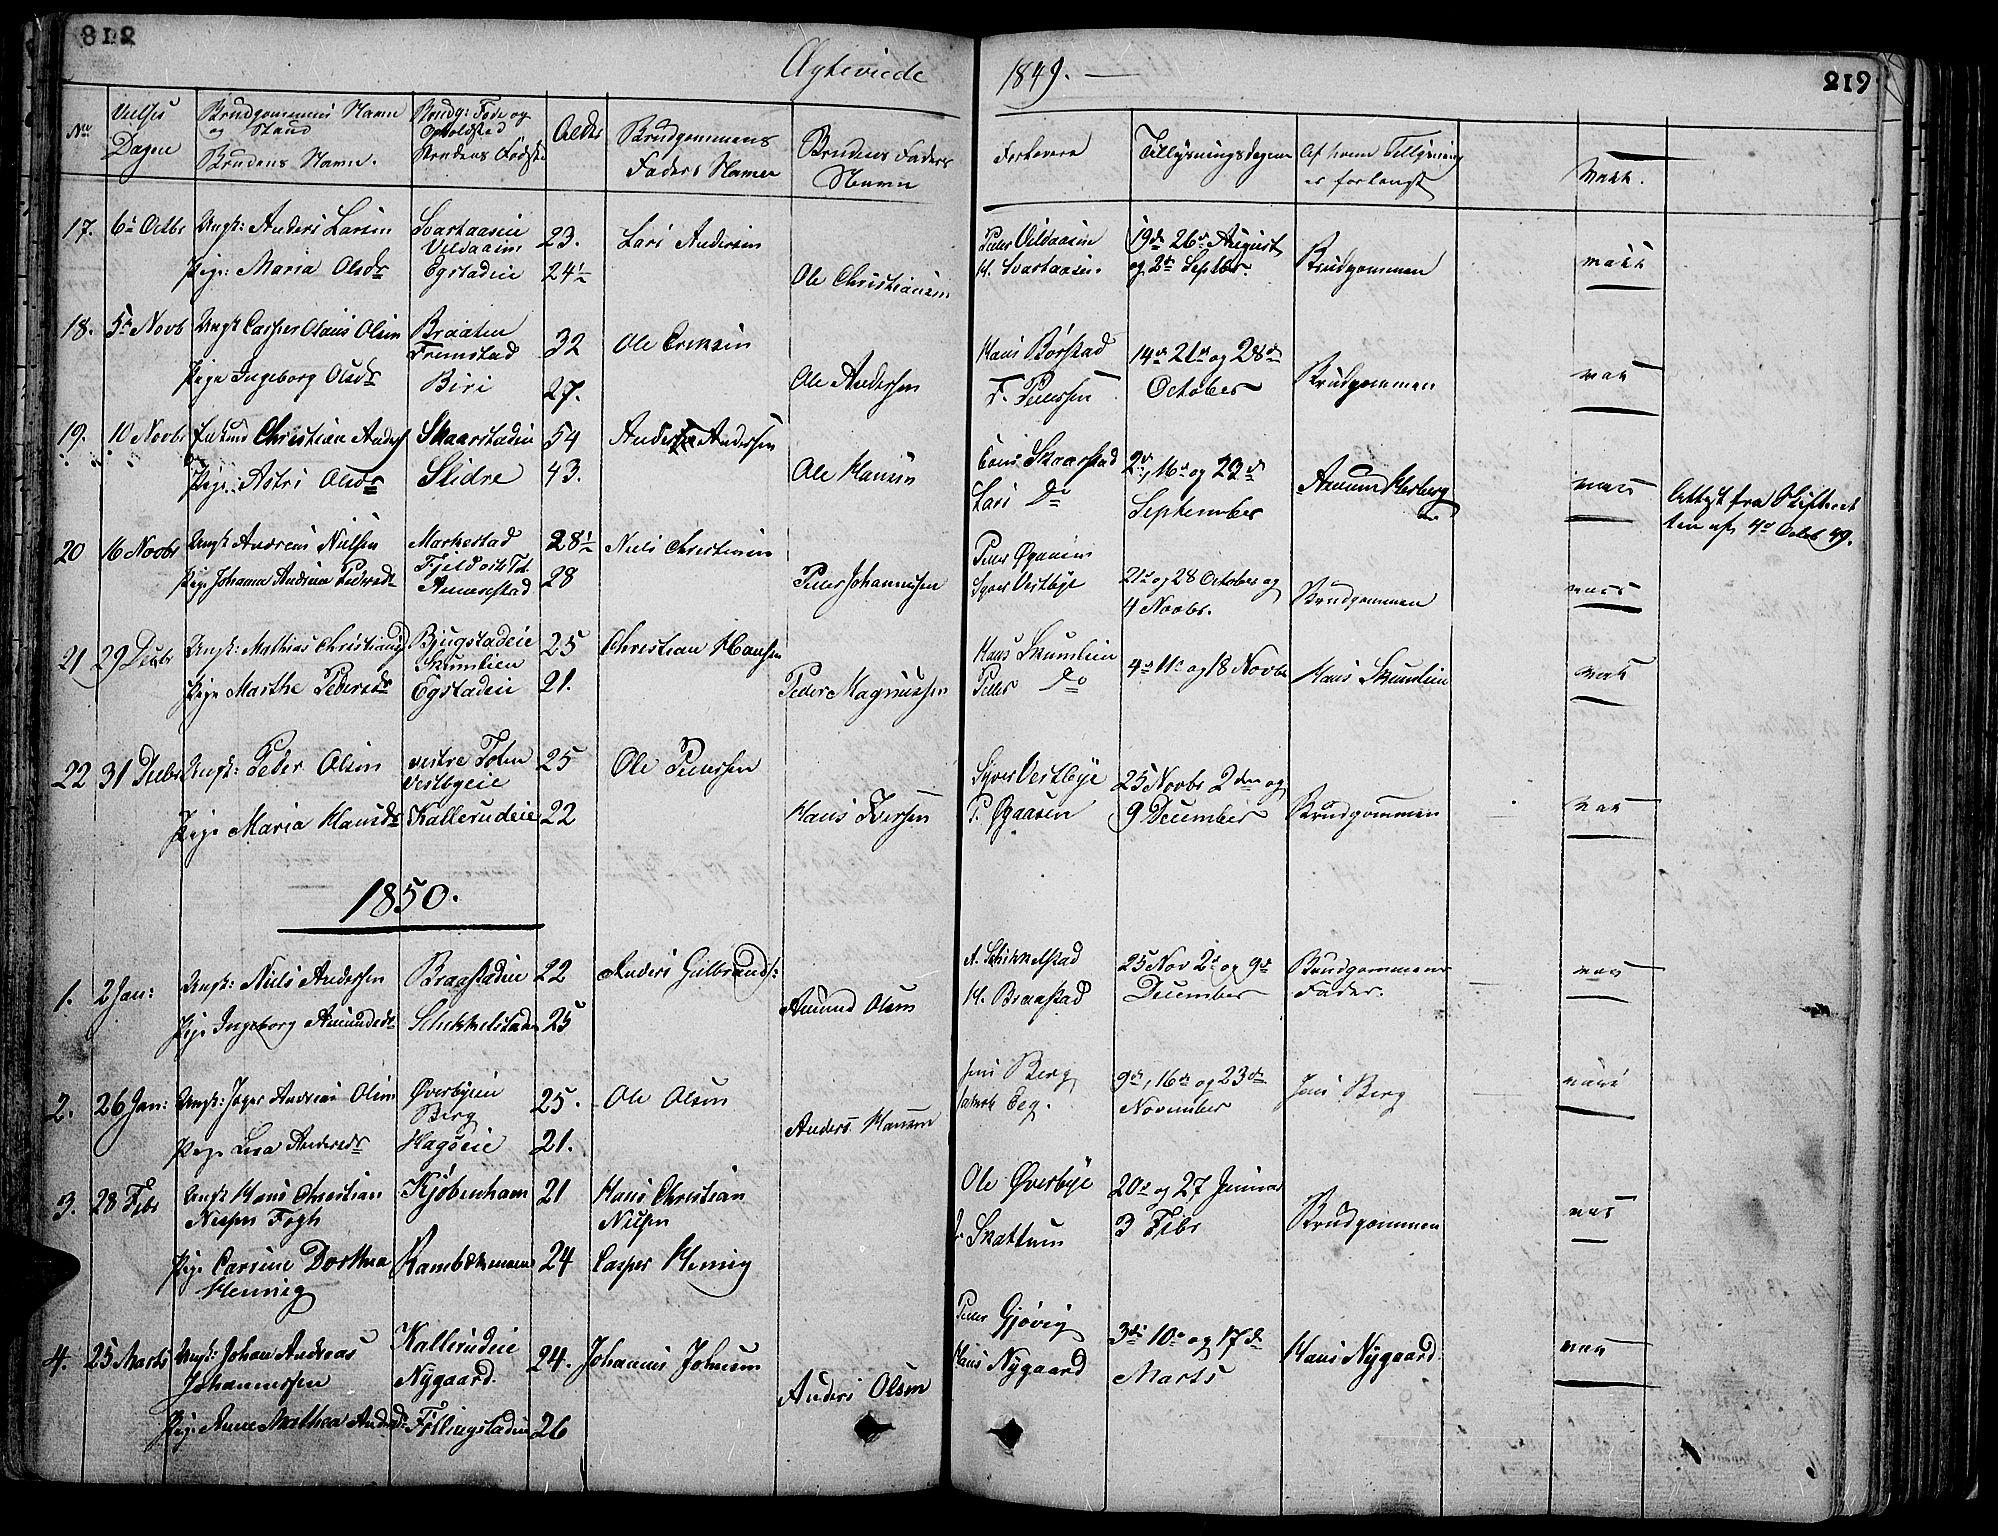 SAH, Vardal prestekontor, H/Ha/Hab/L0004: Klokkerbok nr. 4, 1831-1853, s. 219